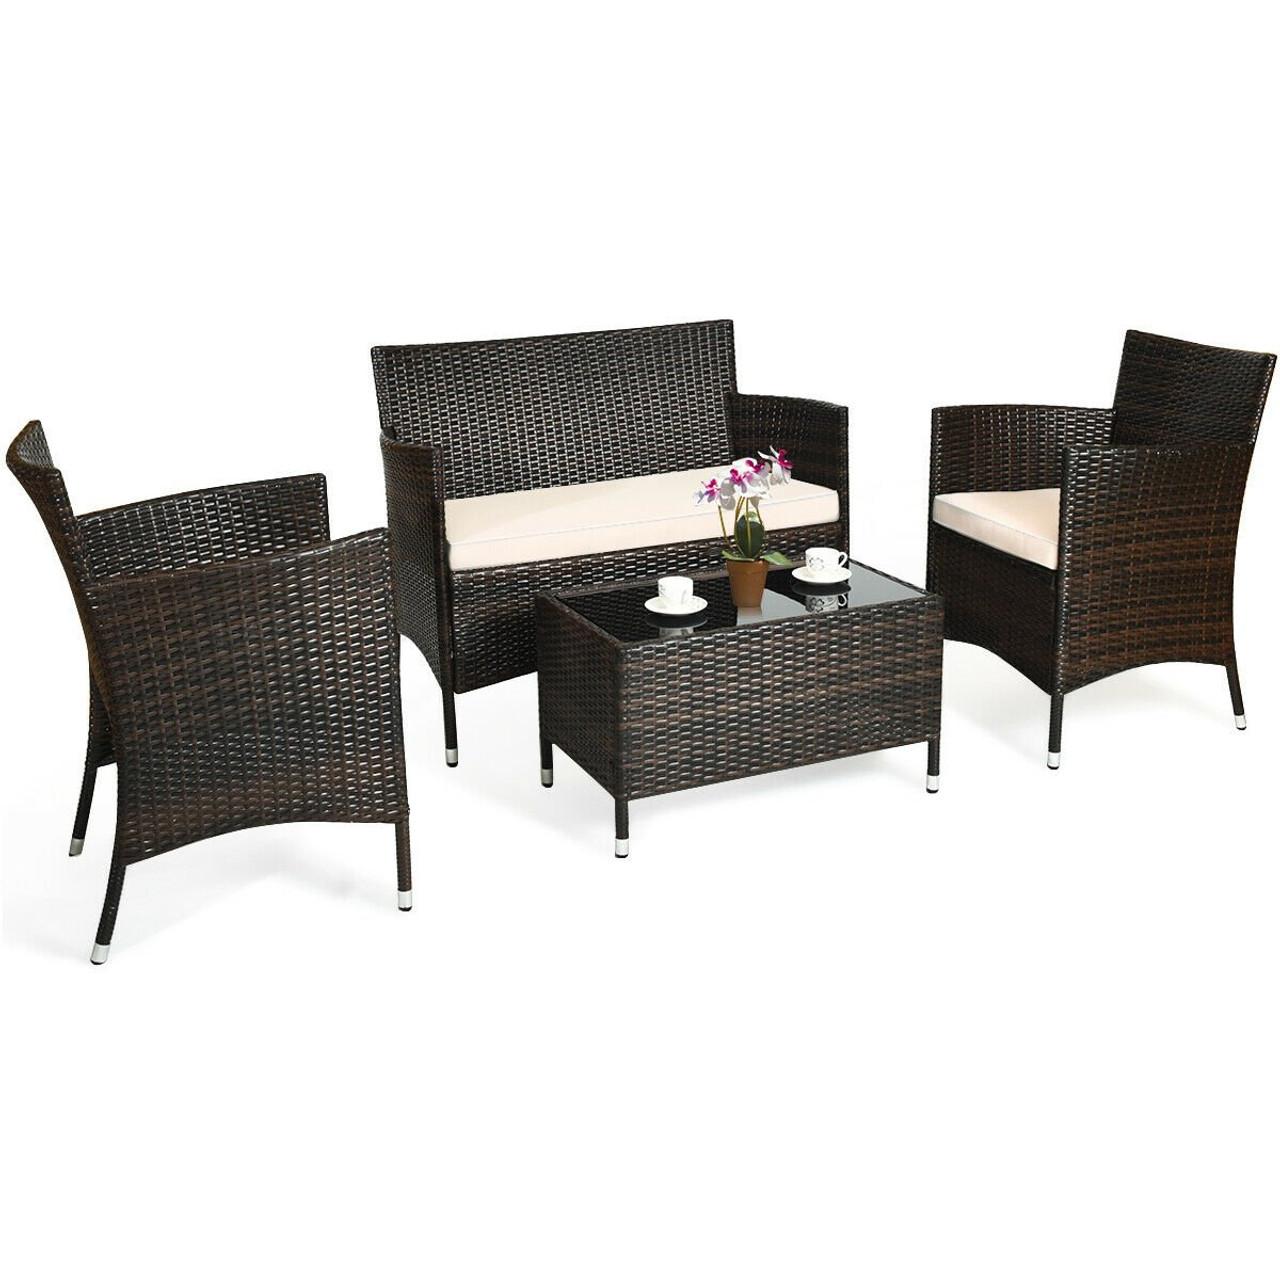 4 Pcs Patio Rattan Conversation Set Outdoor Wicker Furniture Set Hw63214 By Cw